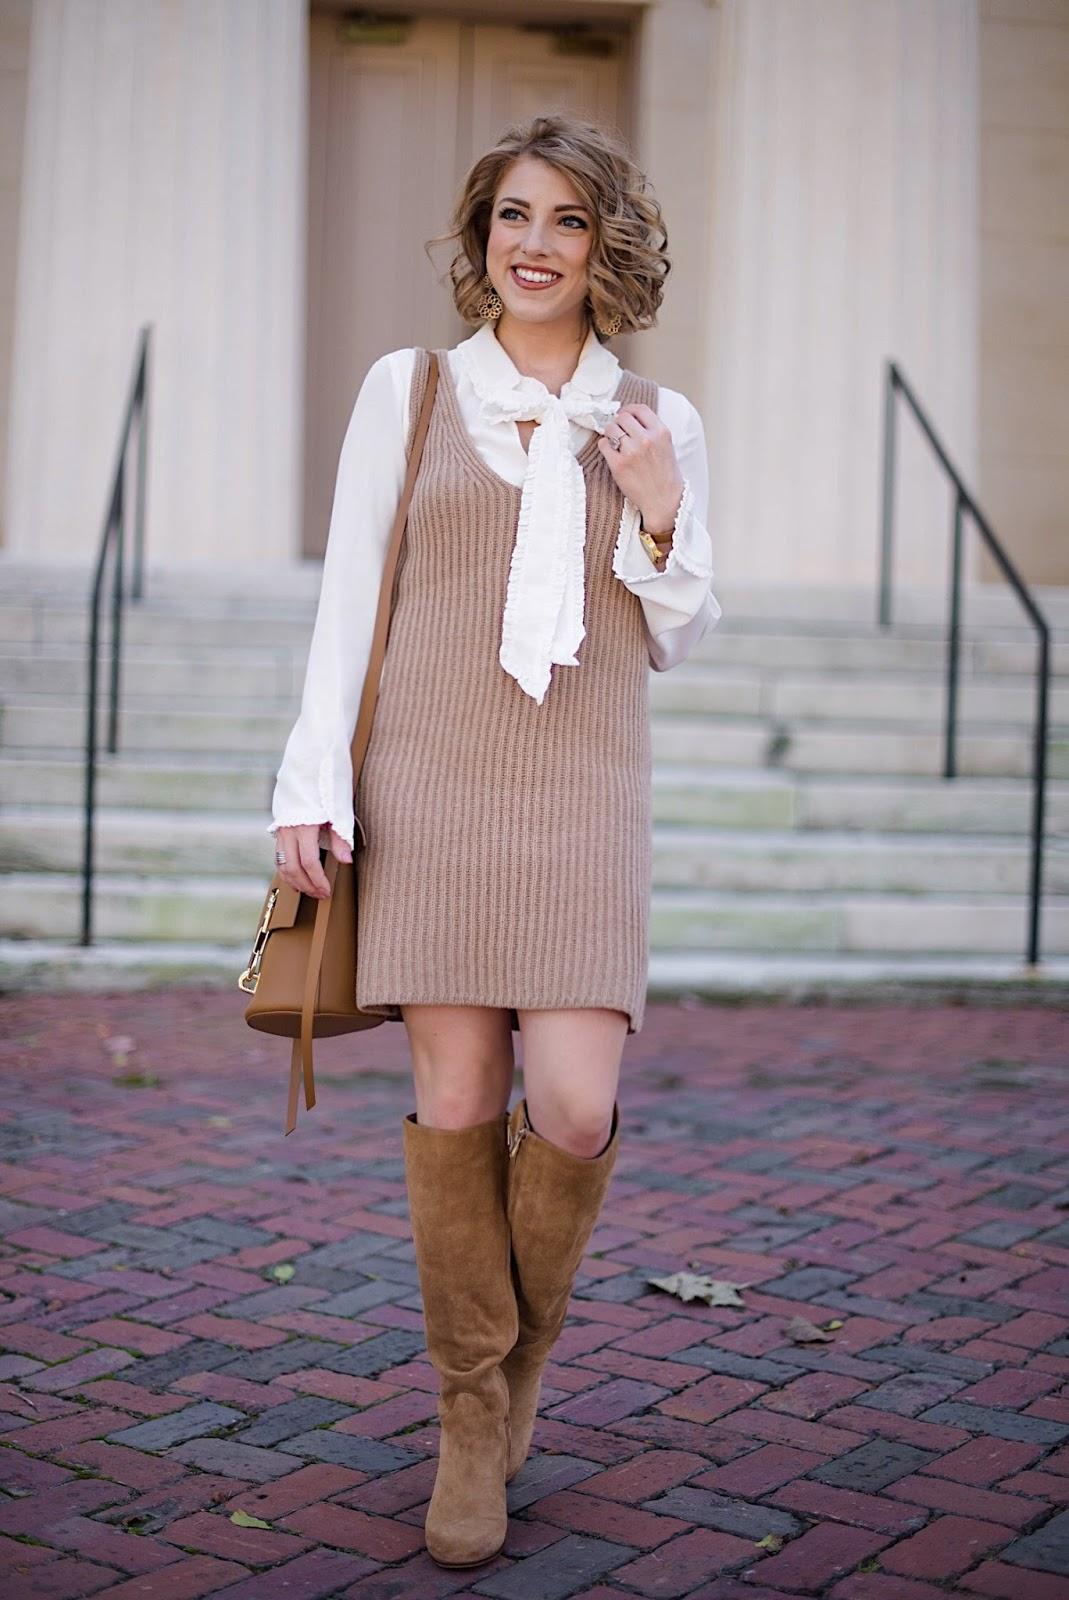 Madewell Sleeveless Sweater Dress - Fall Fashion on Something Delightful Blog